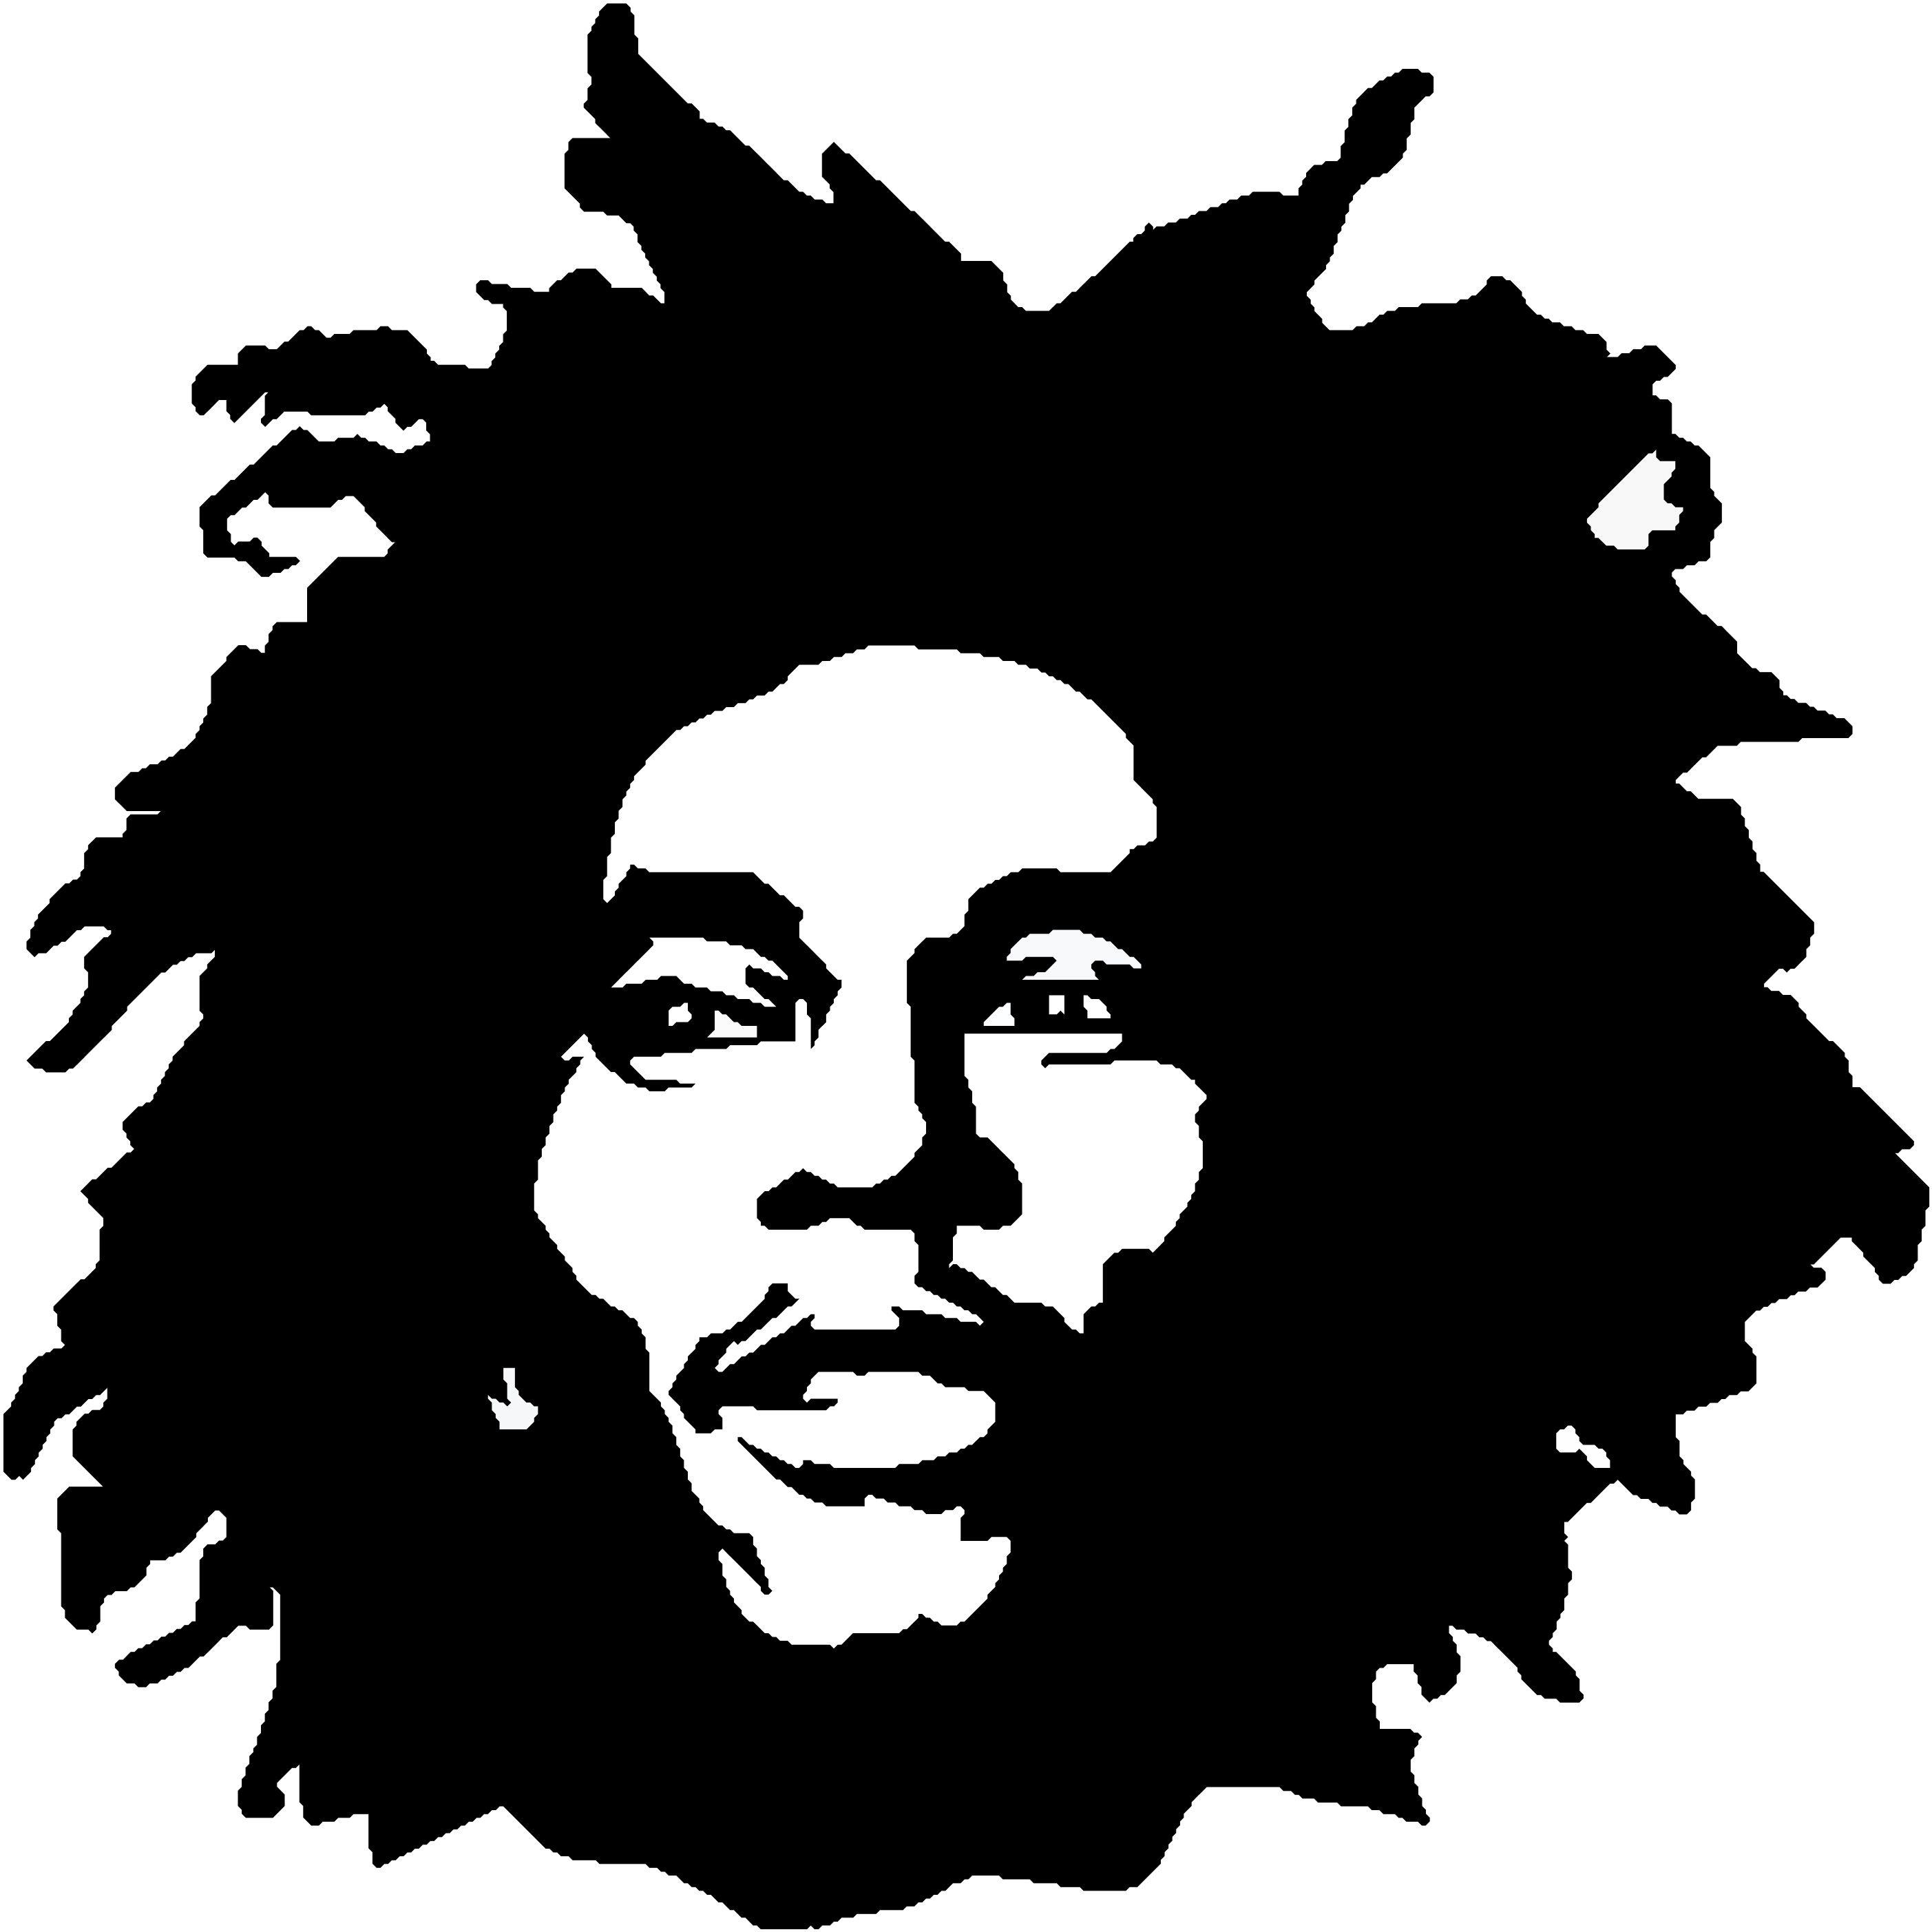 Black And White Google: Bob Marley Monochrome - Google Search